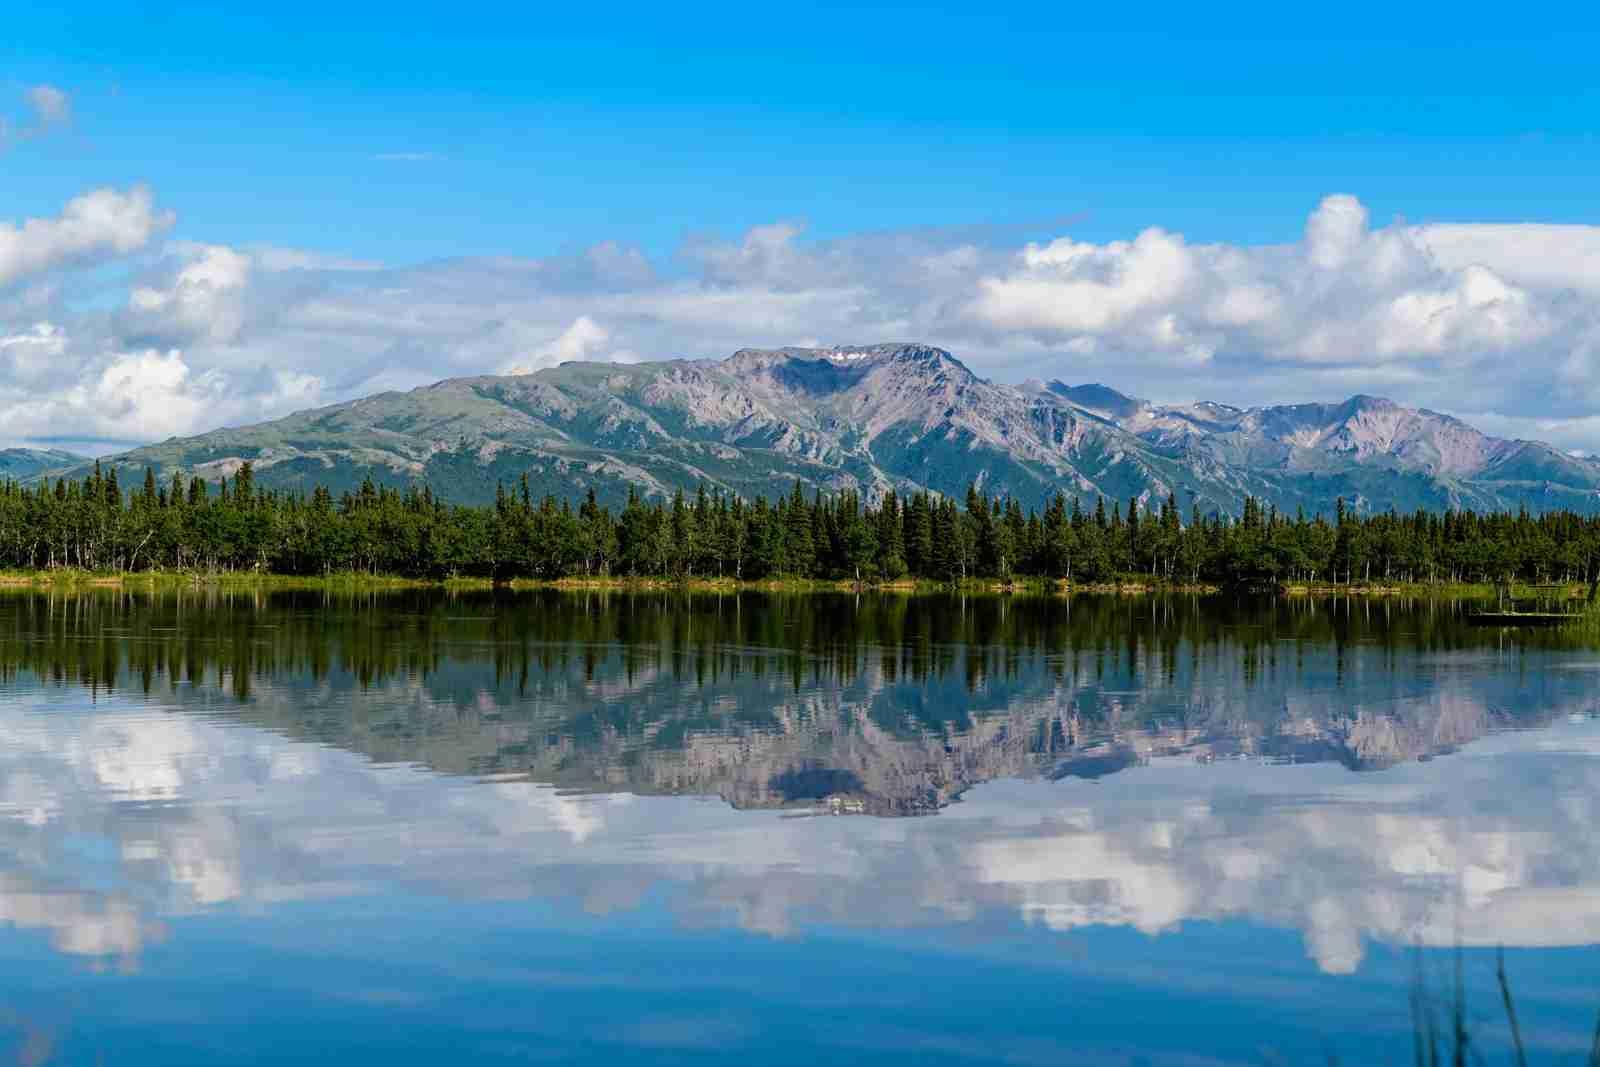 Denali National Park (Photo by Hari Nandakumar/Unsplash)